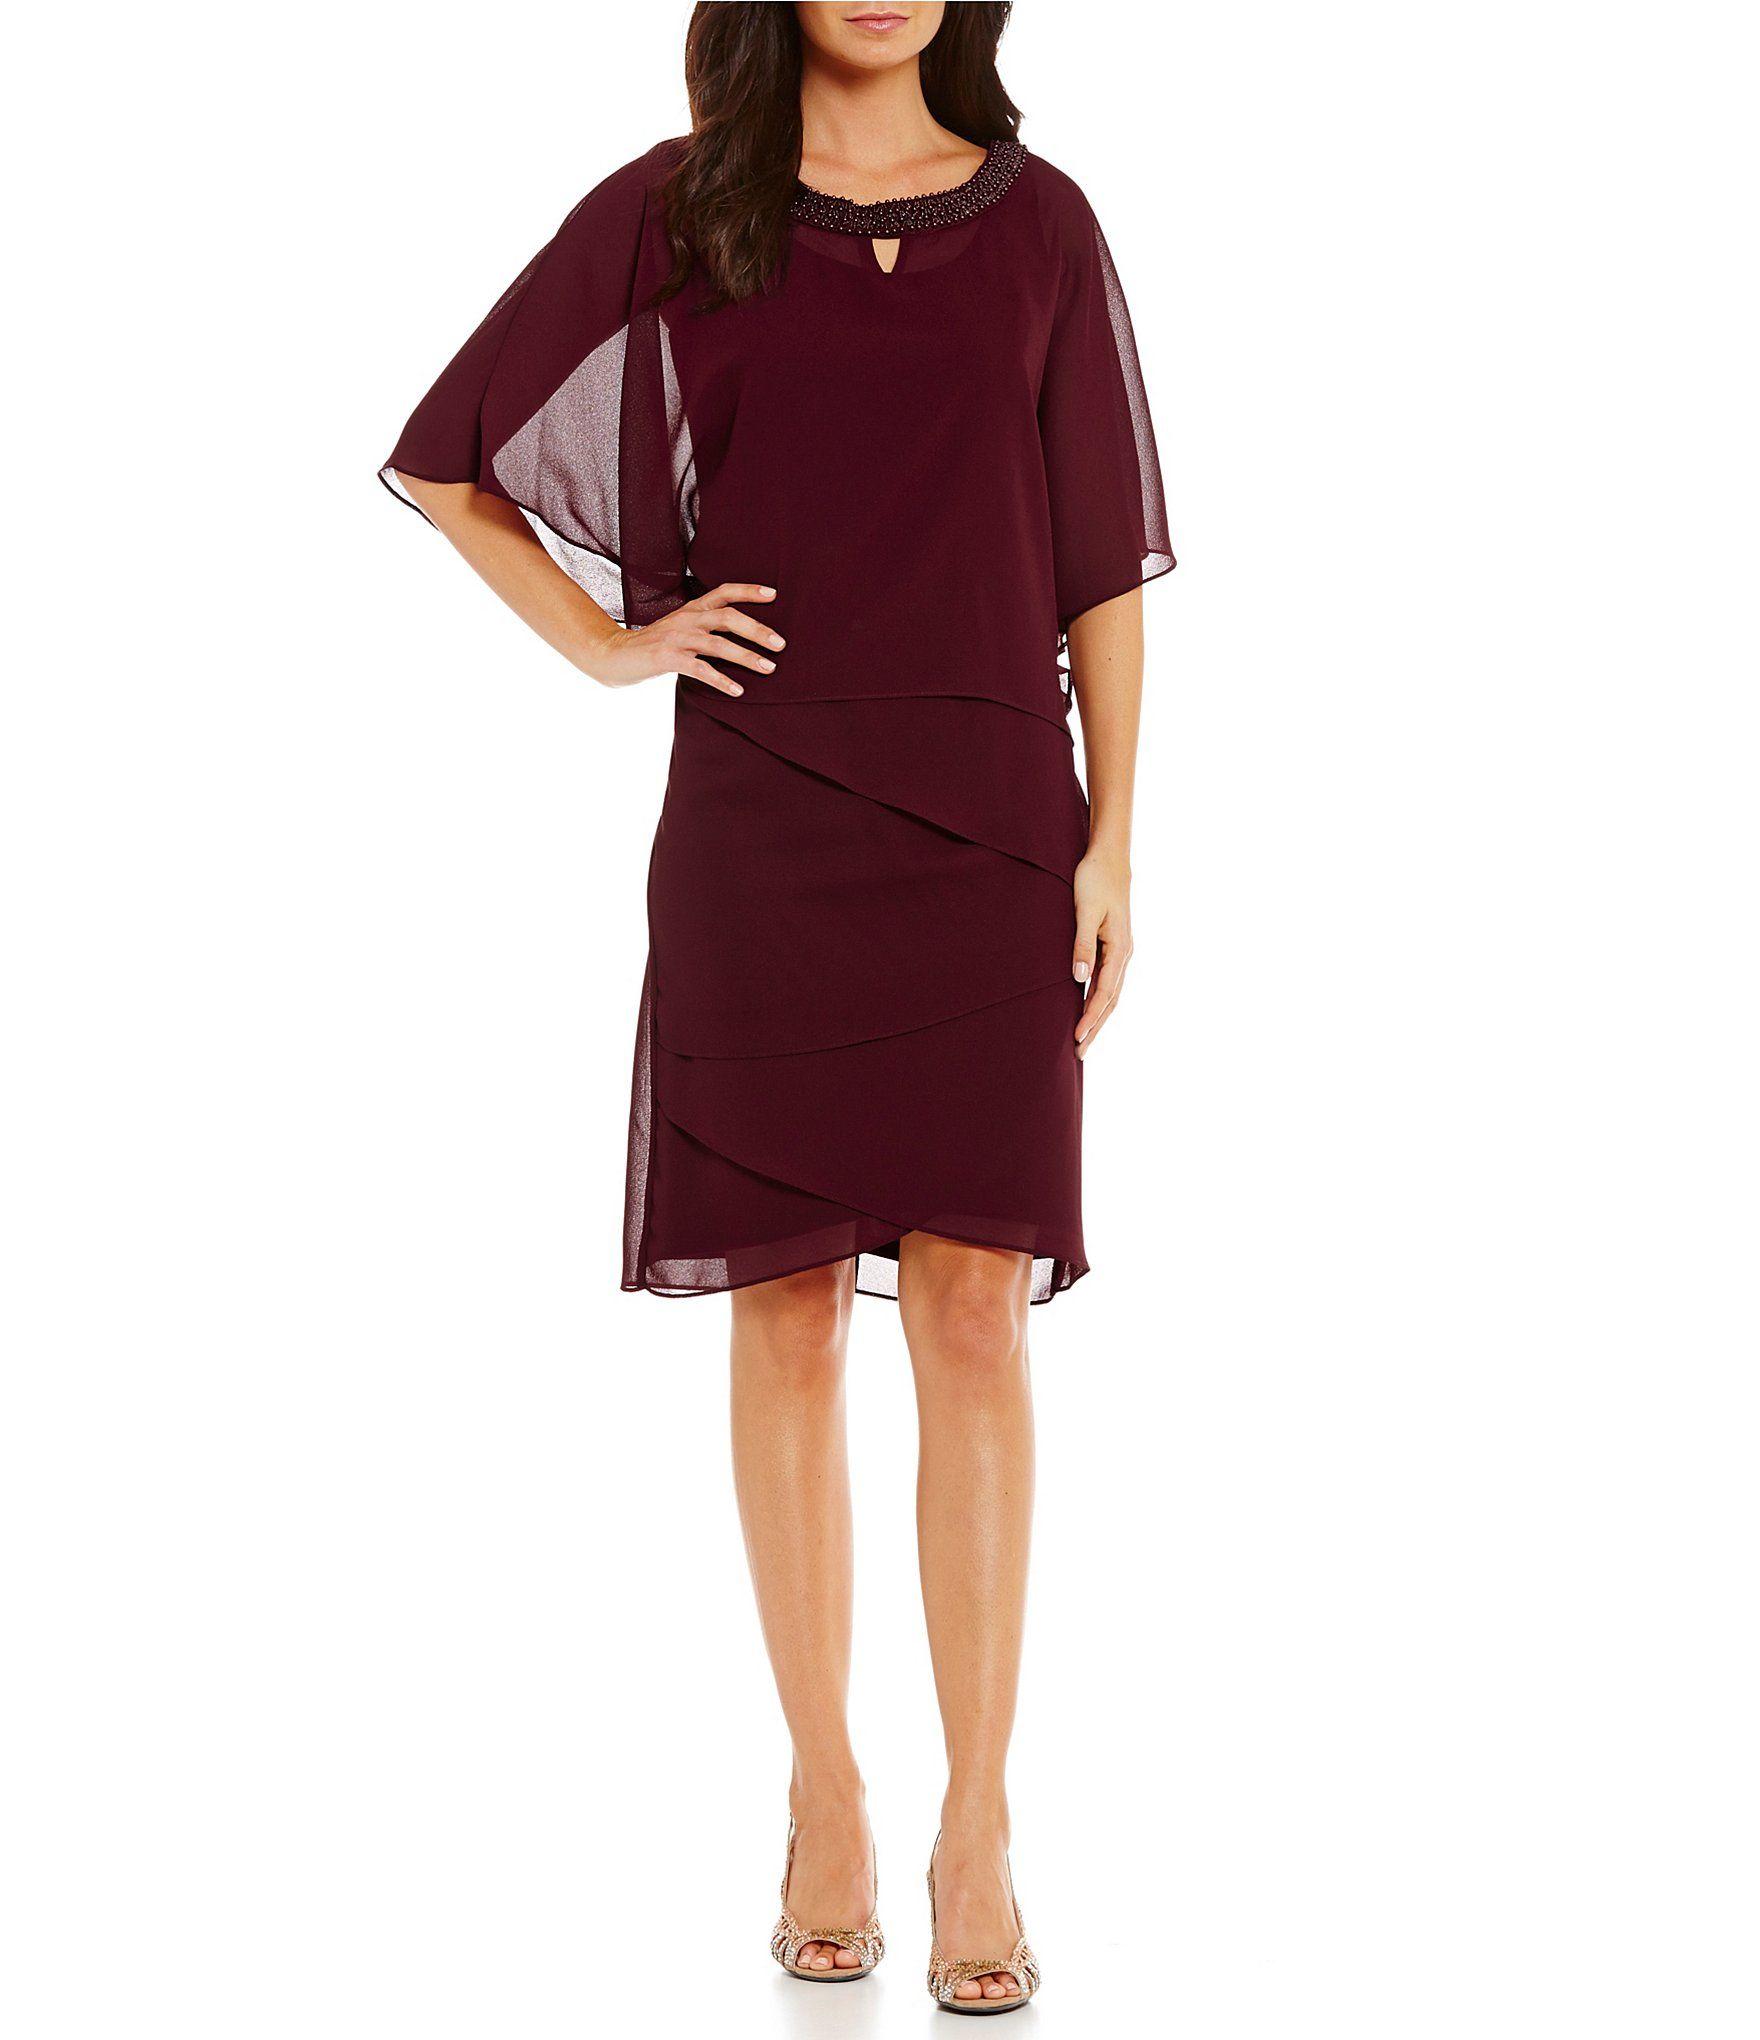 Le Bos Beaded-Neck Capelet 2-Piece Dress